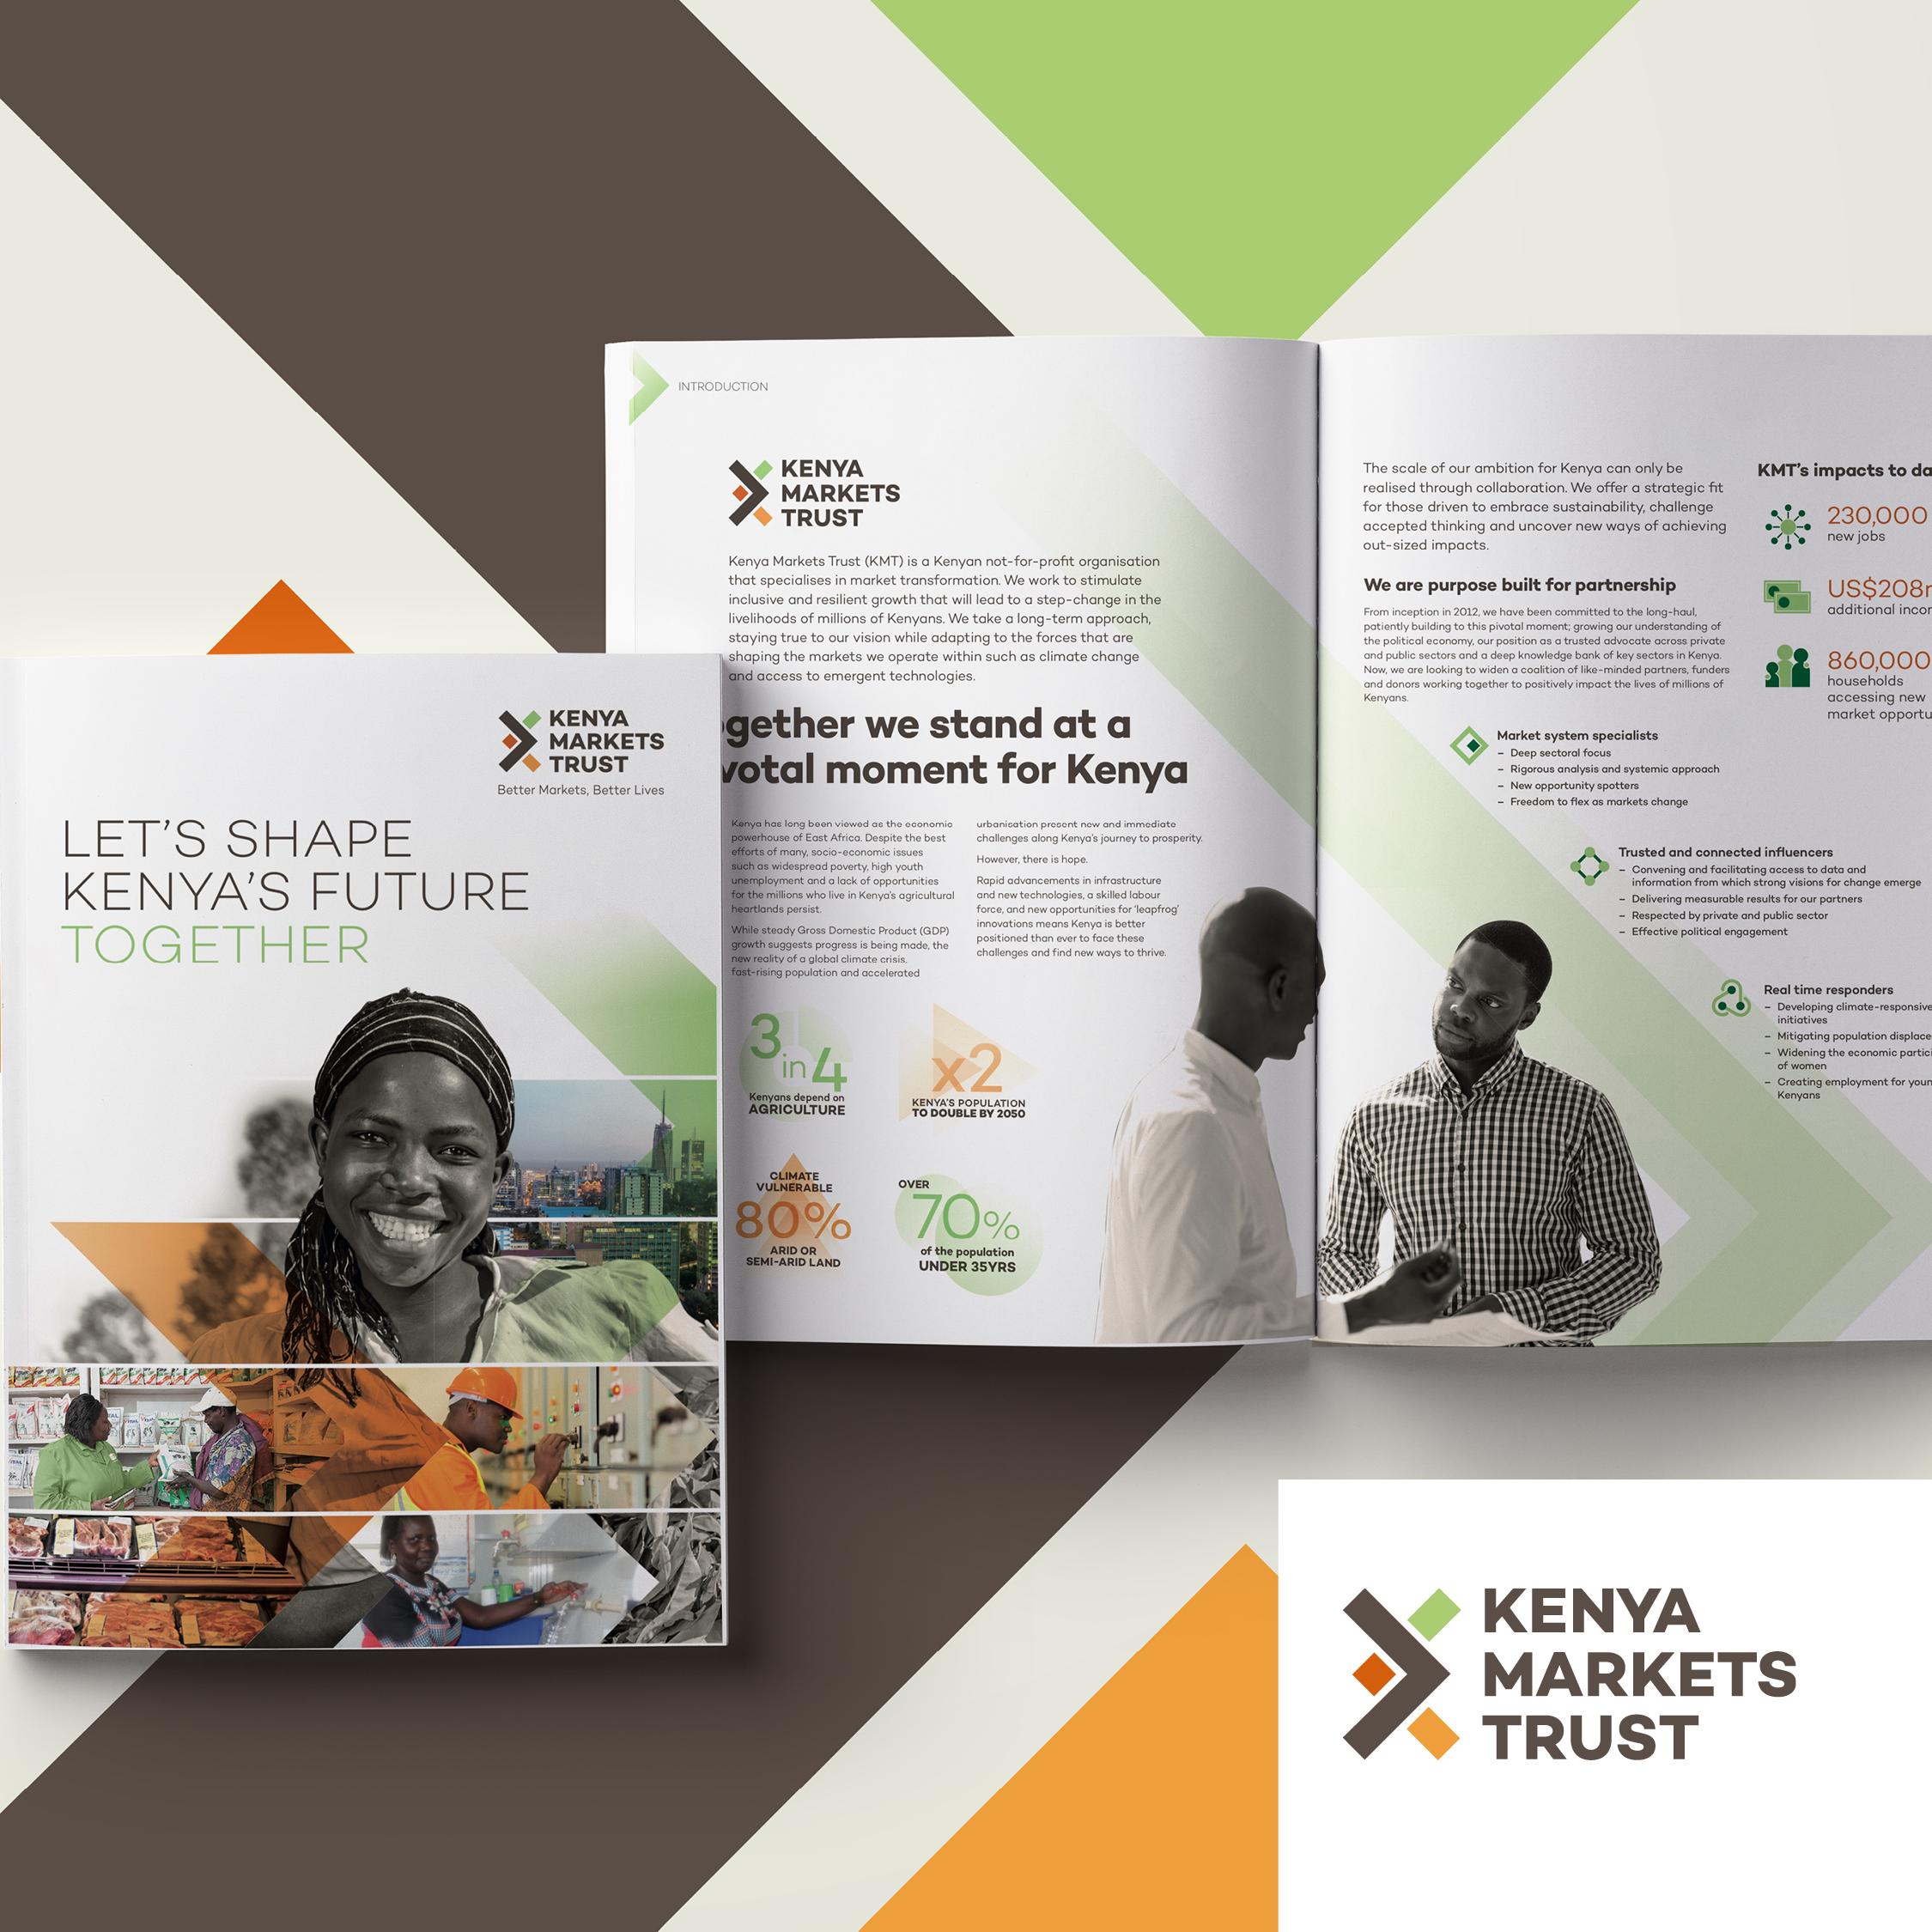 Kenya Markets Trust